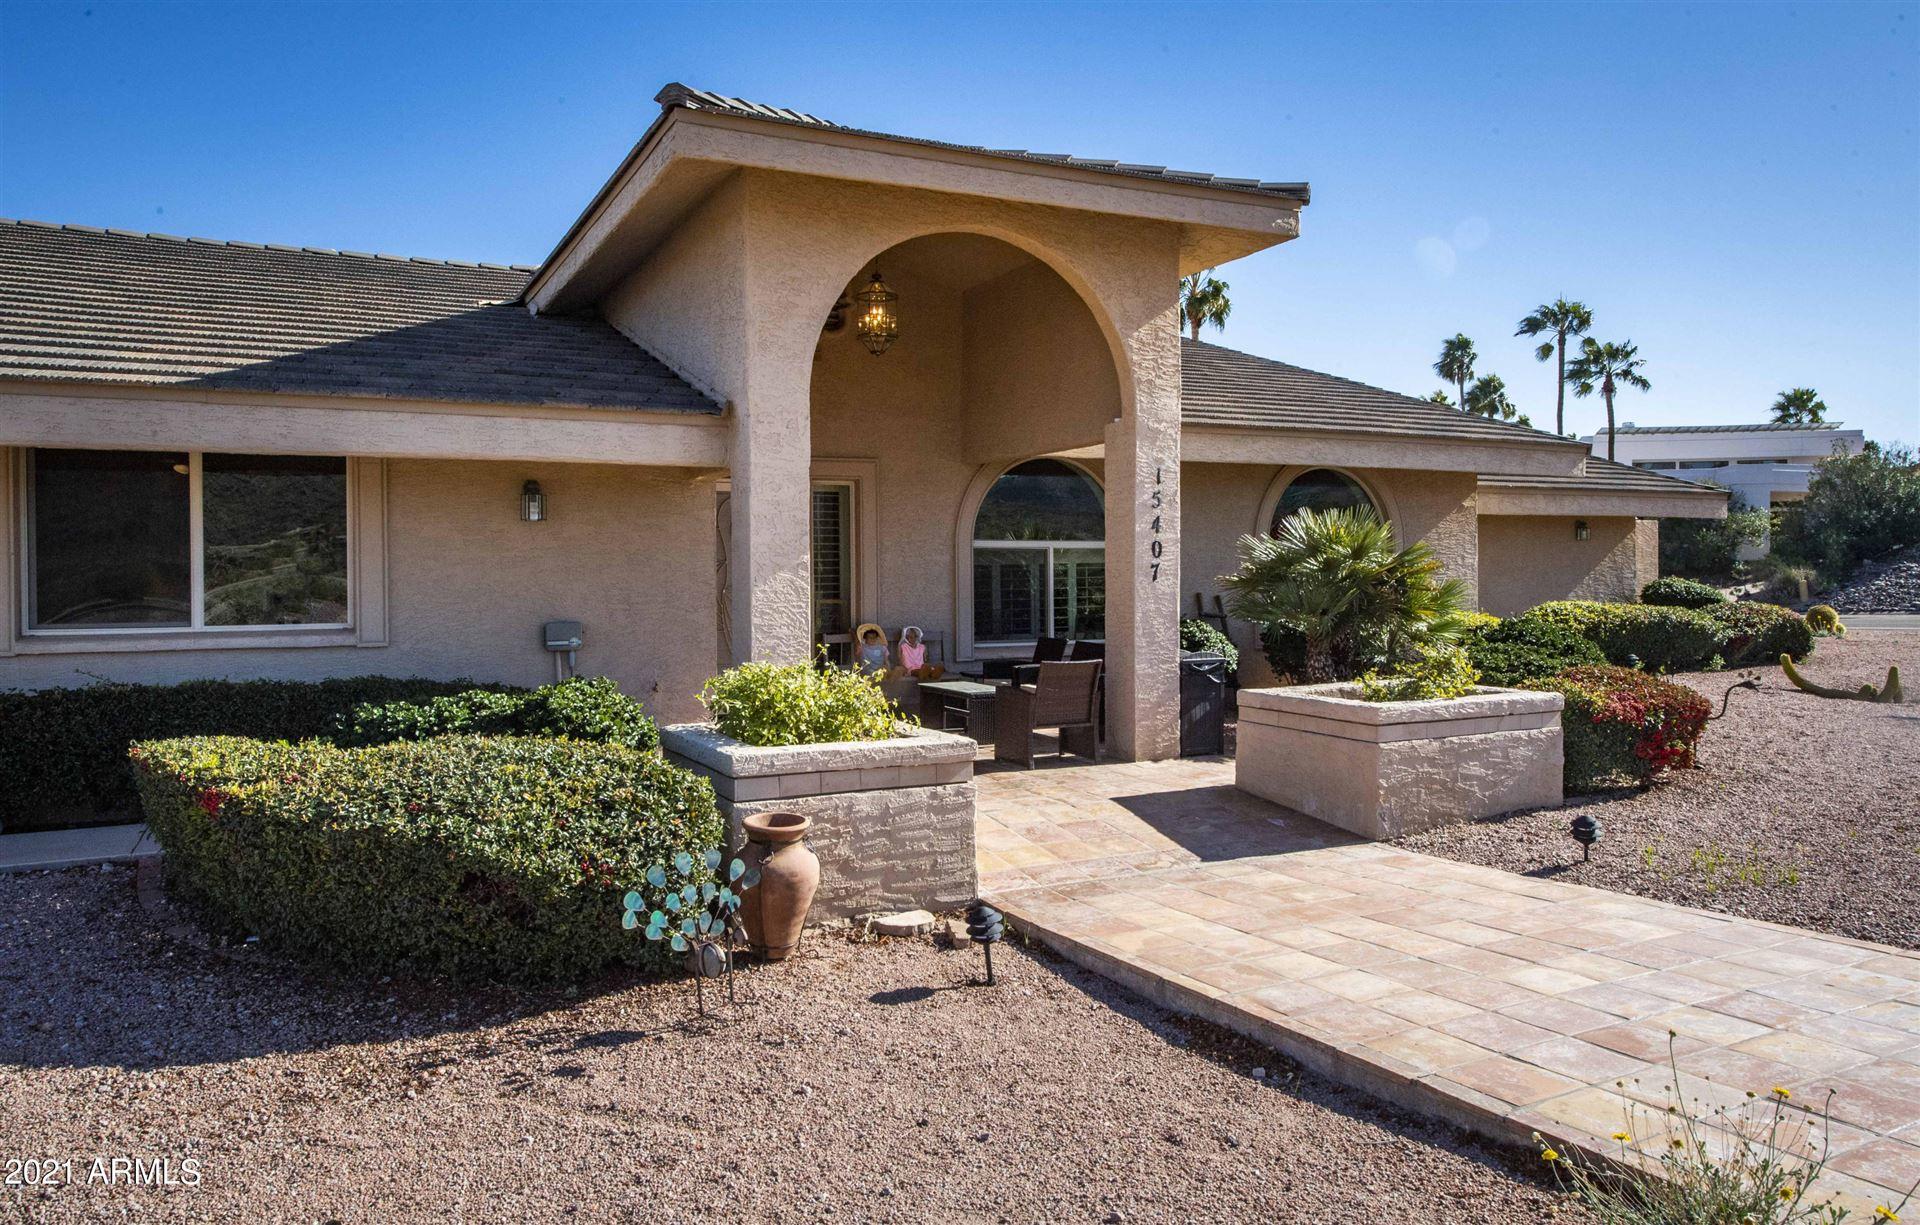 Photo of 15407 E Palisades Boulevard, Fountain Hills, AZ 85268 (MLS # 6197647)